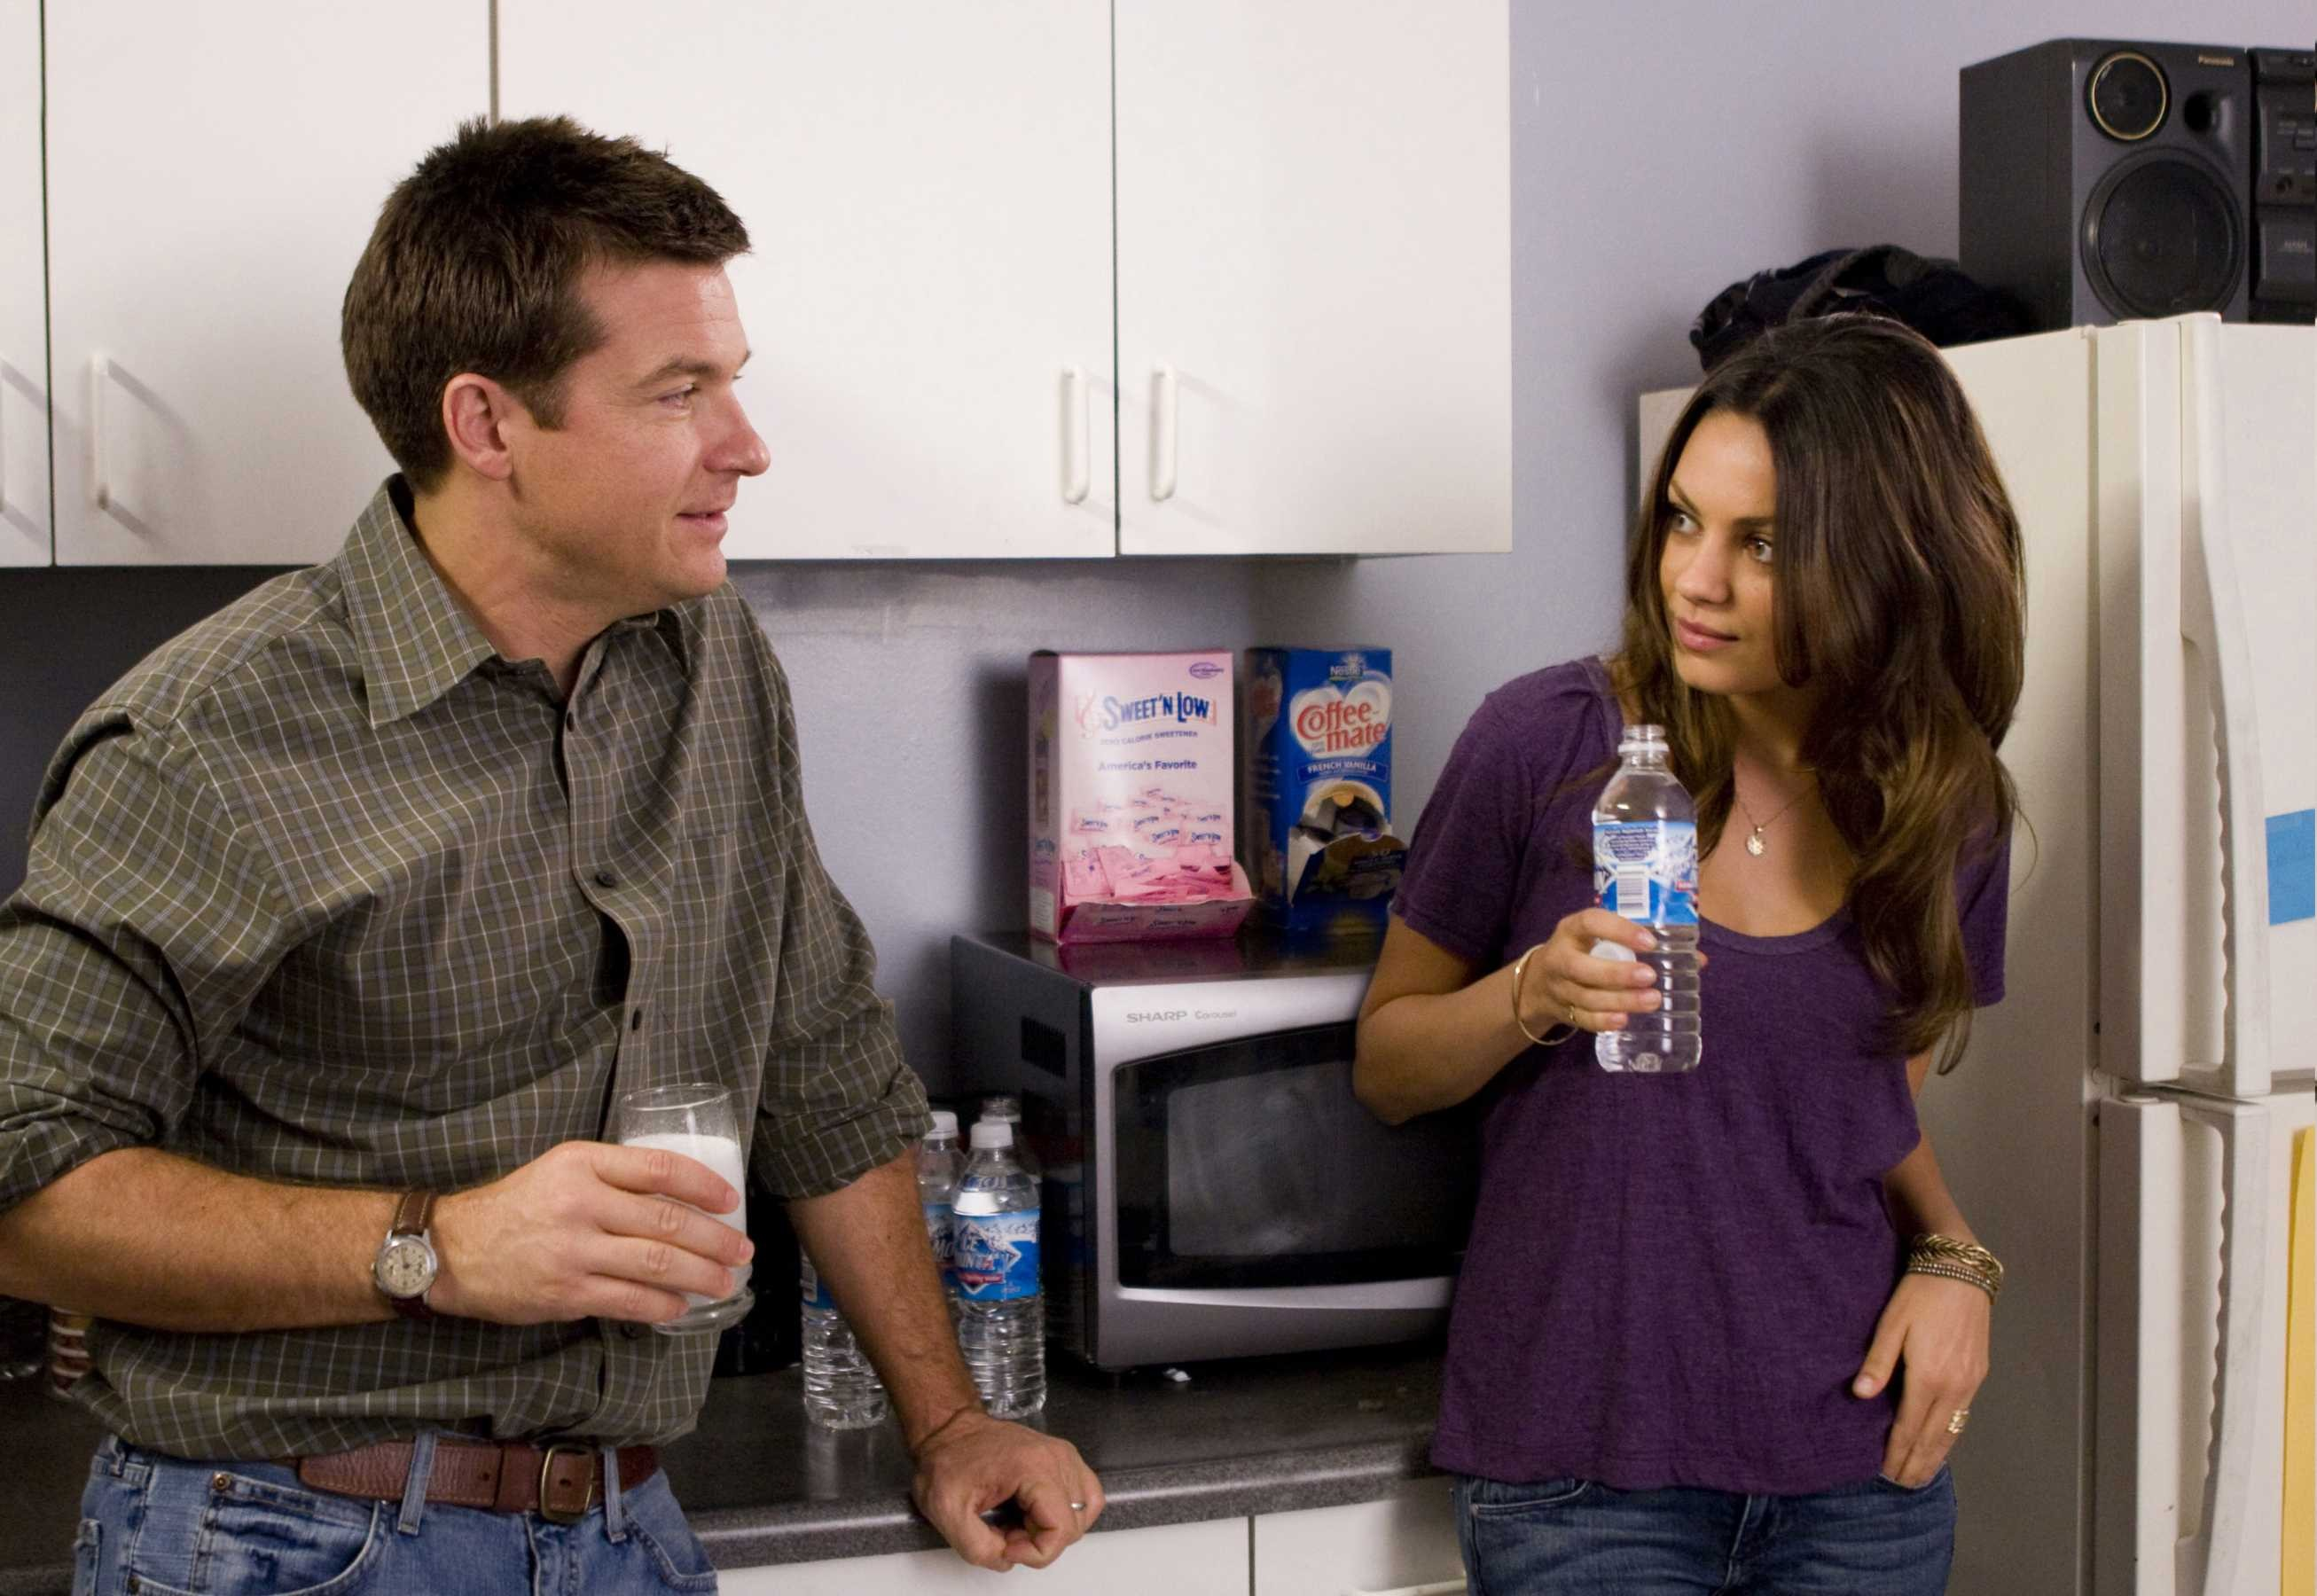 Jason Bateman,Mila Kunis